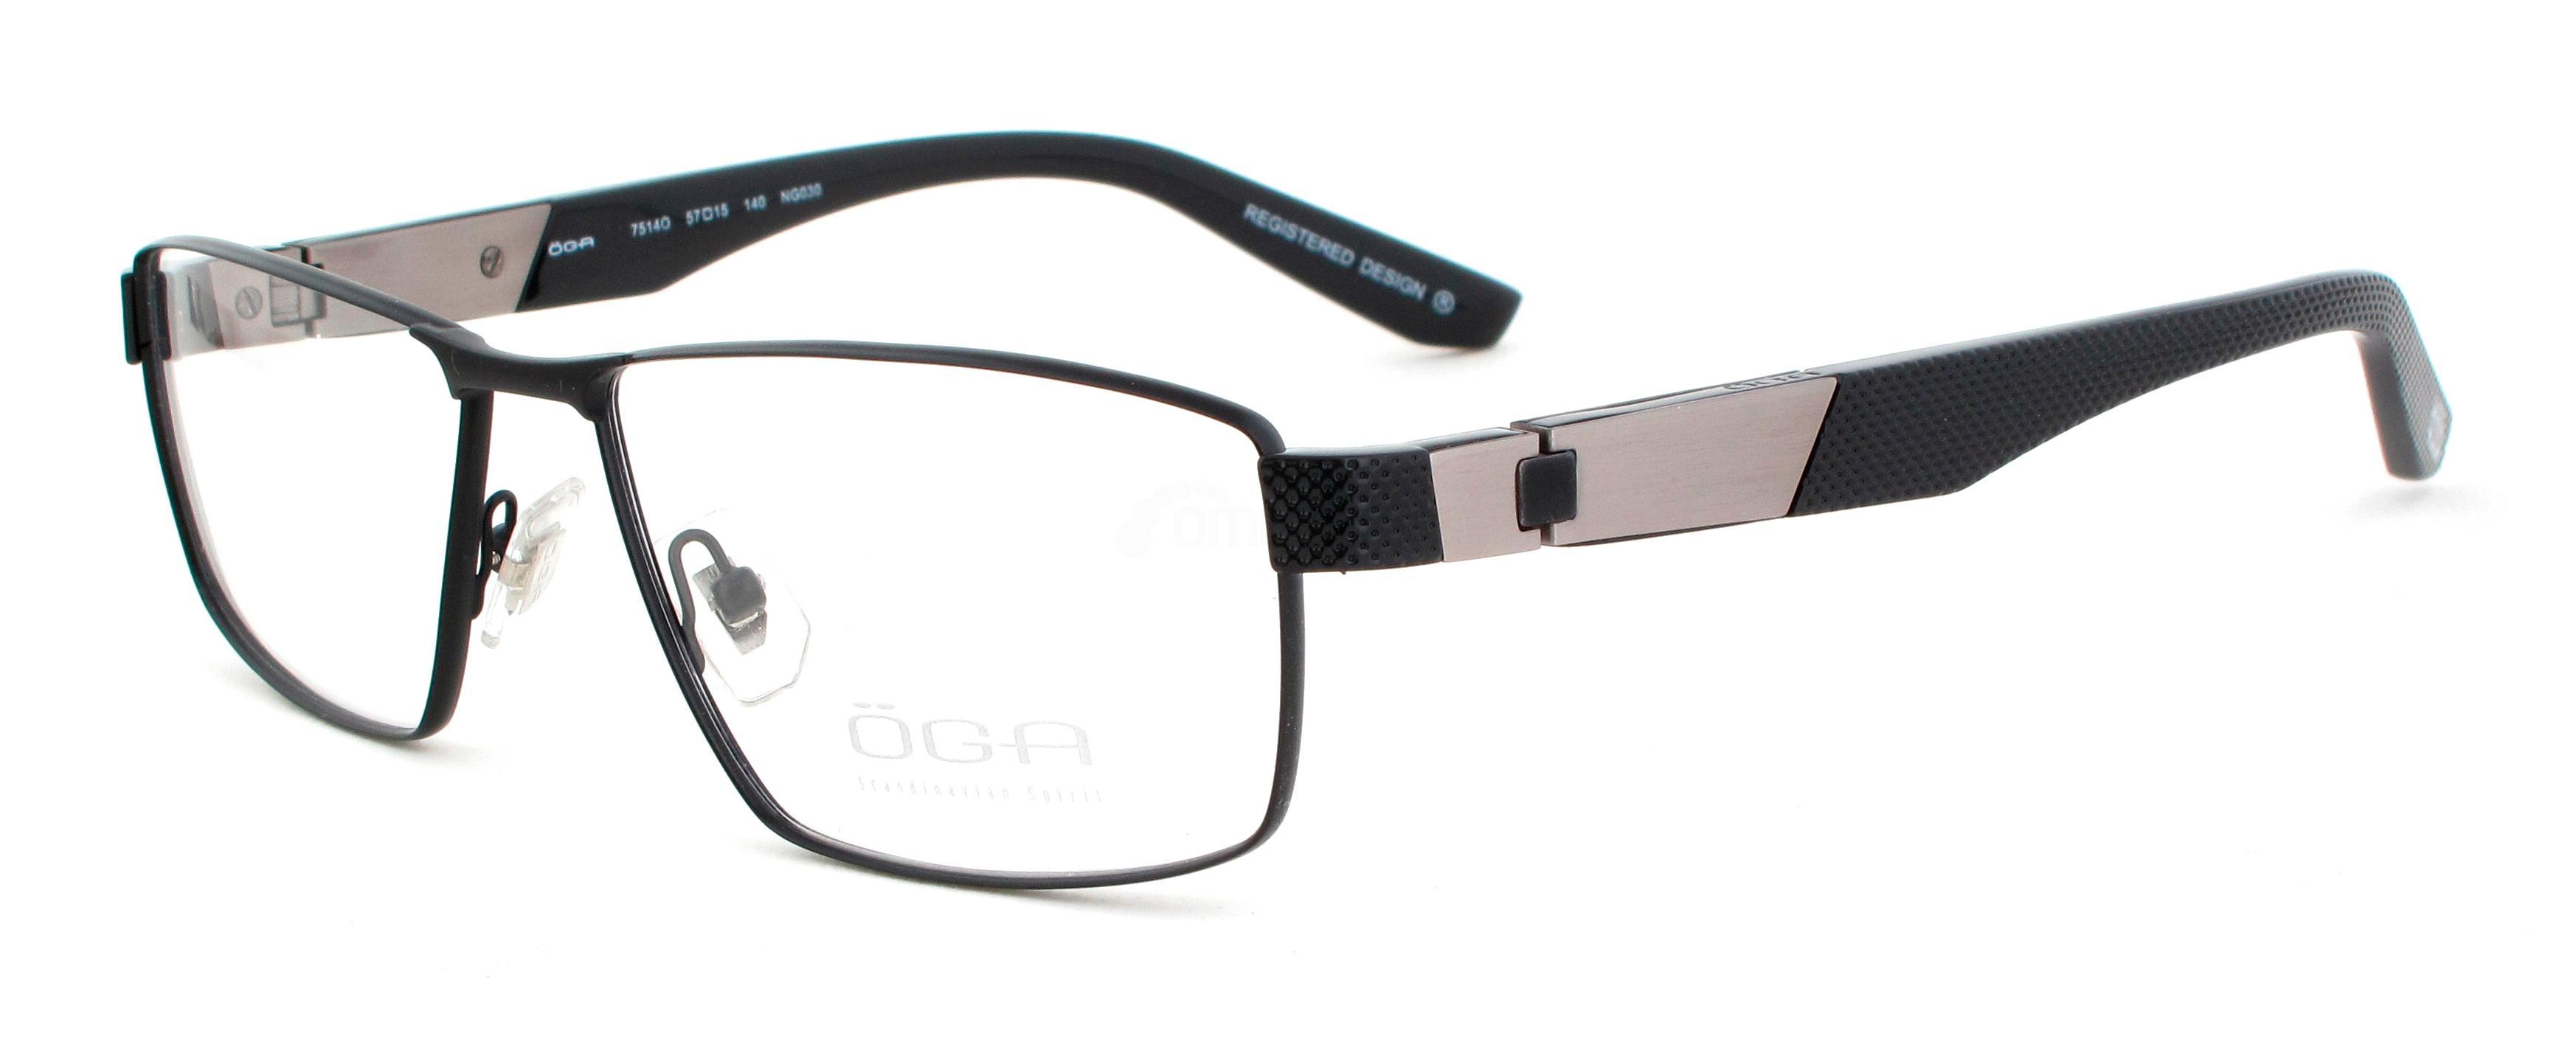 NG030 7514O FALK 3 Glasses, ÖGA Scandinavian Spirit